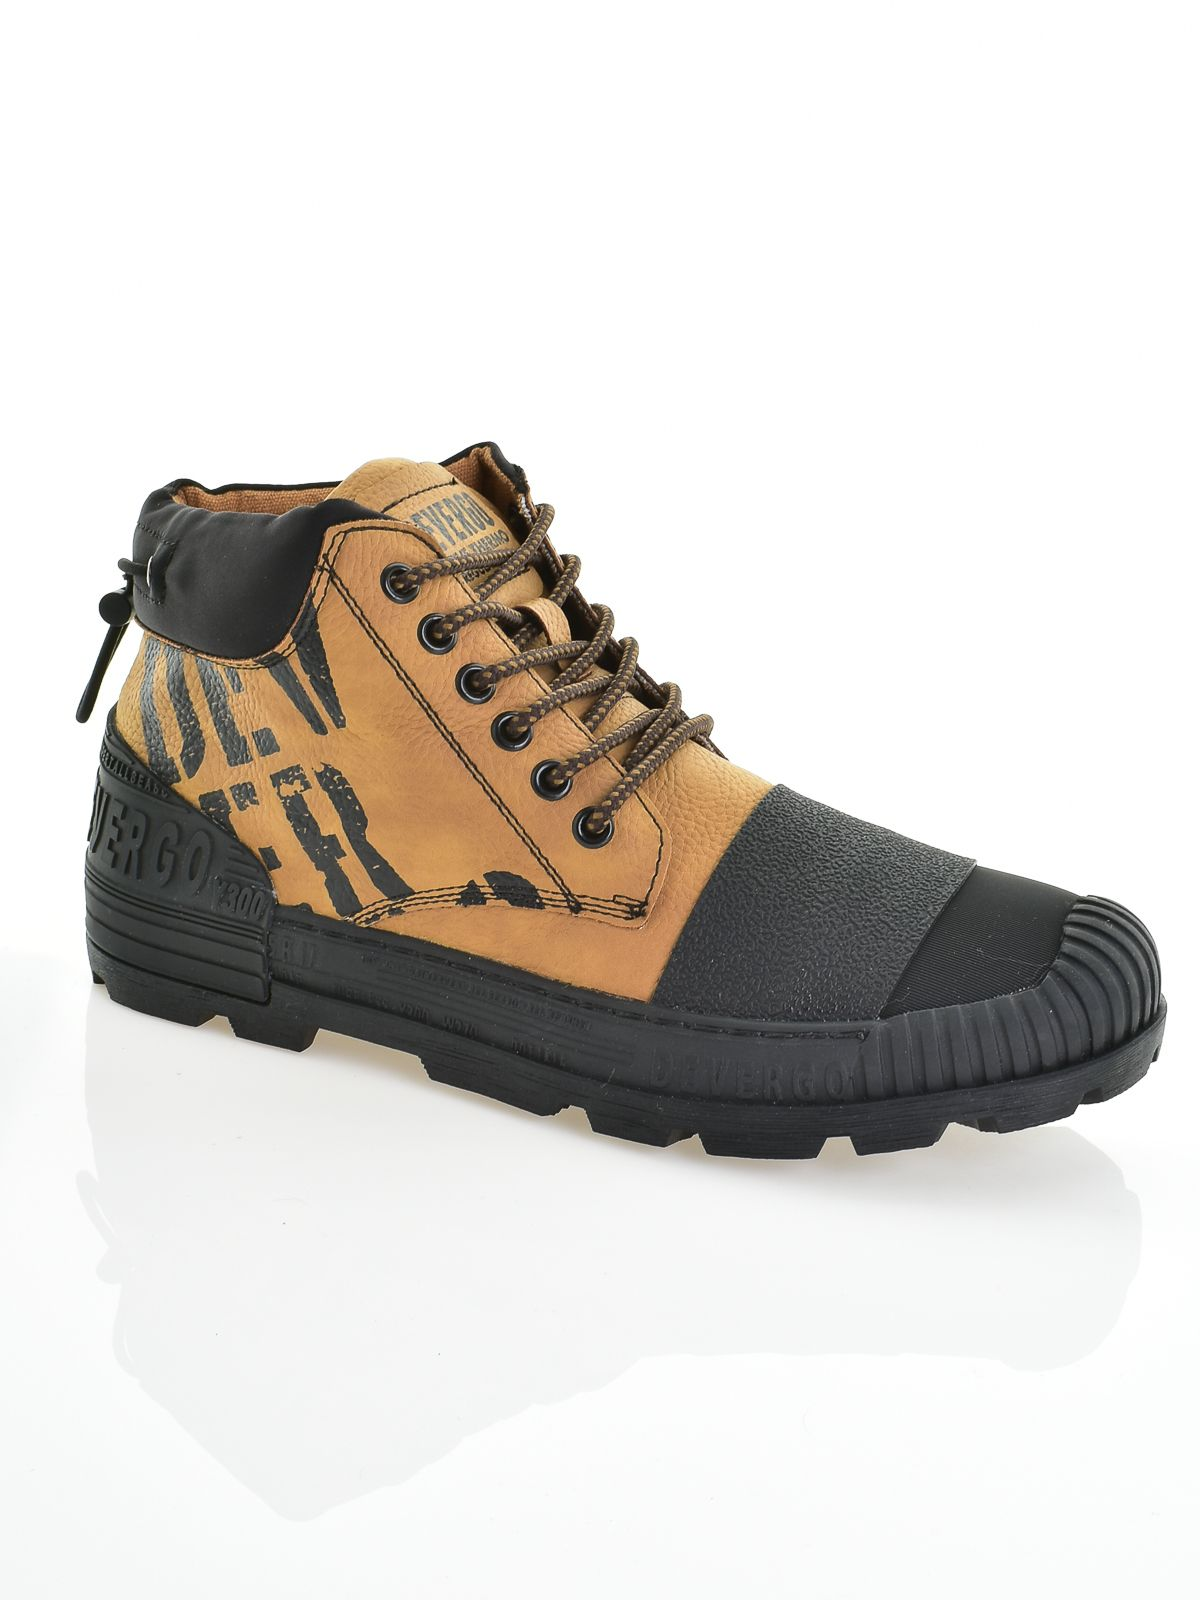 AKCIÓ! Devergo Meteor férfi bakancs Férfi cipők Férfi